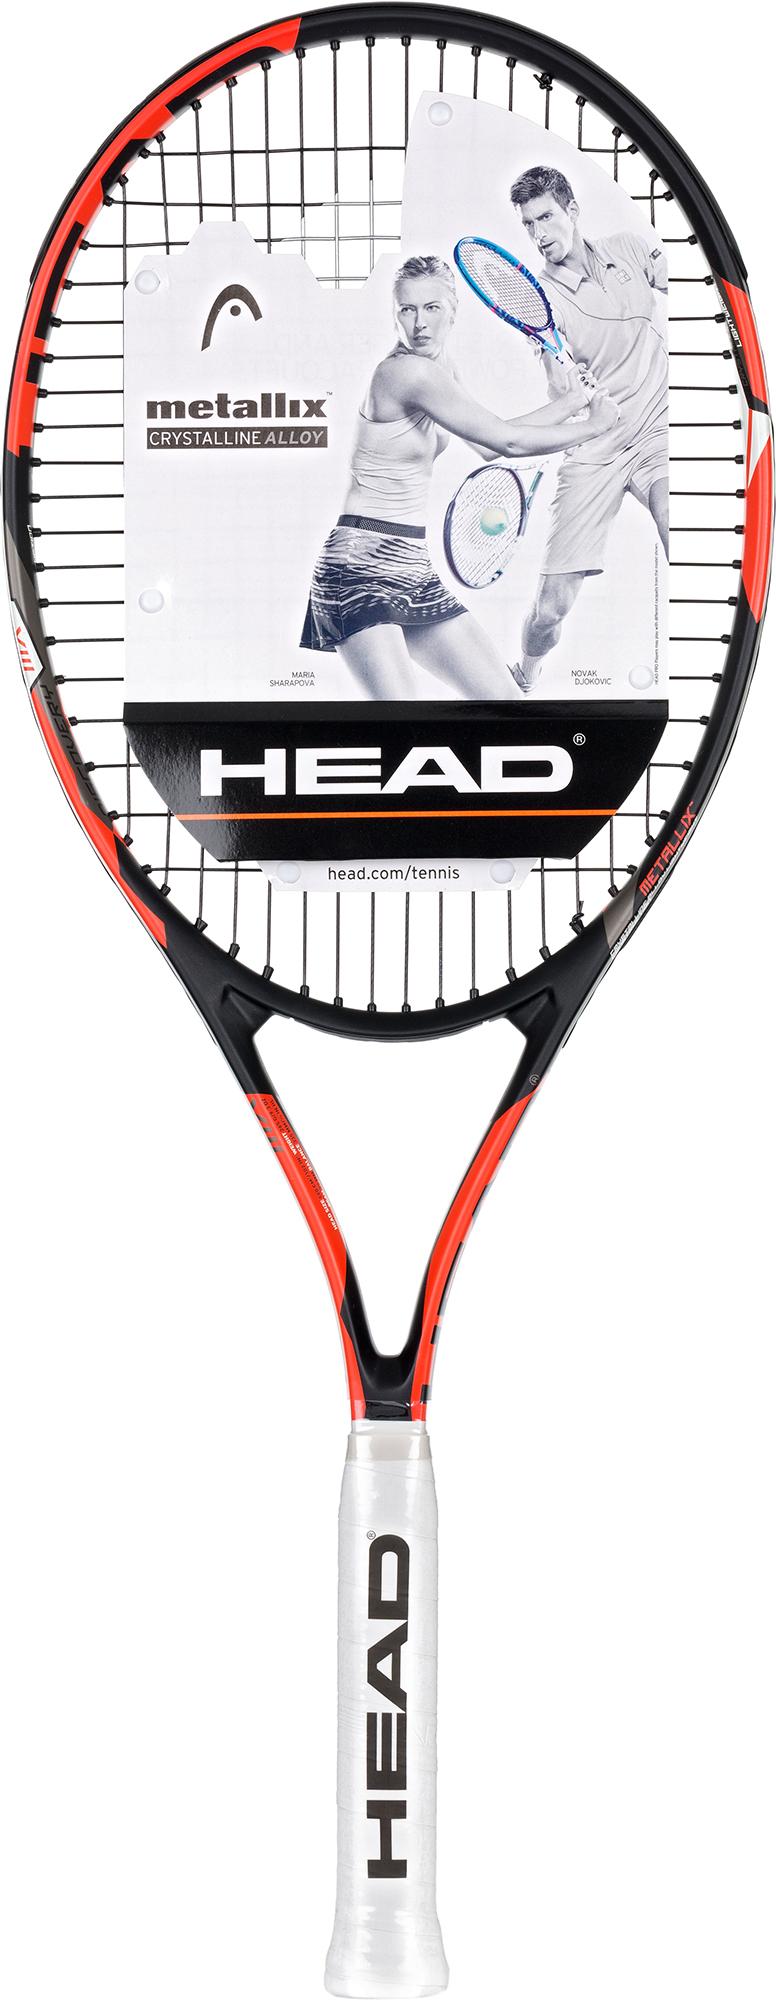 Head Ракетка для большого тенниса Head 27' Discovery сетки для тенниса большого